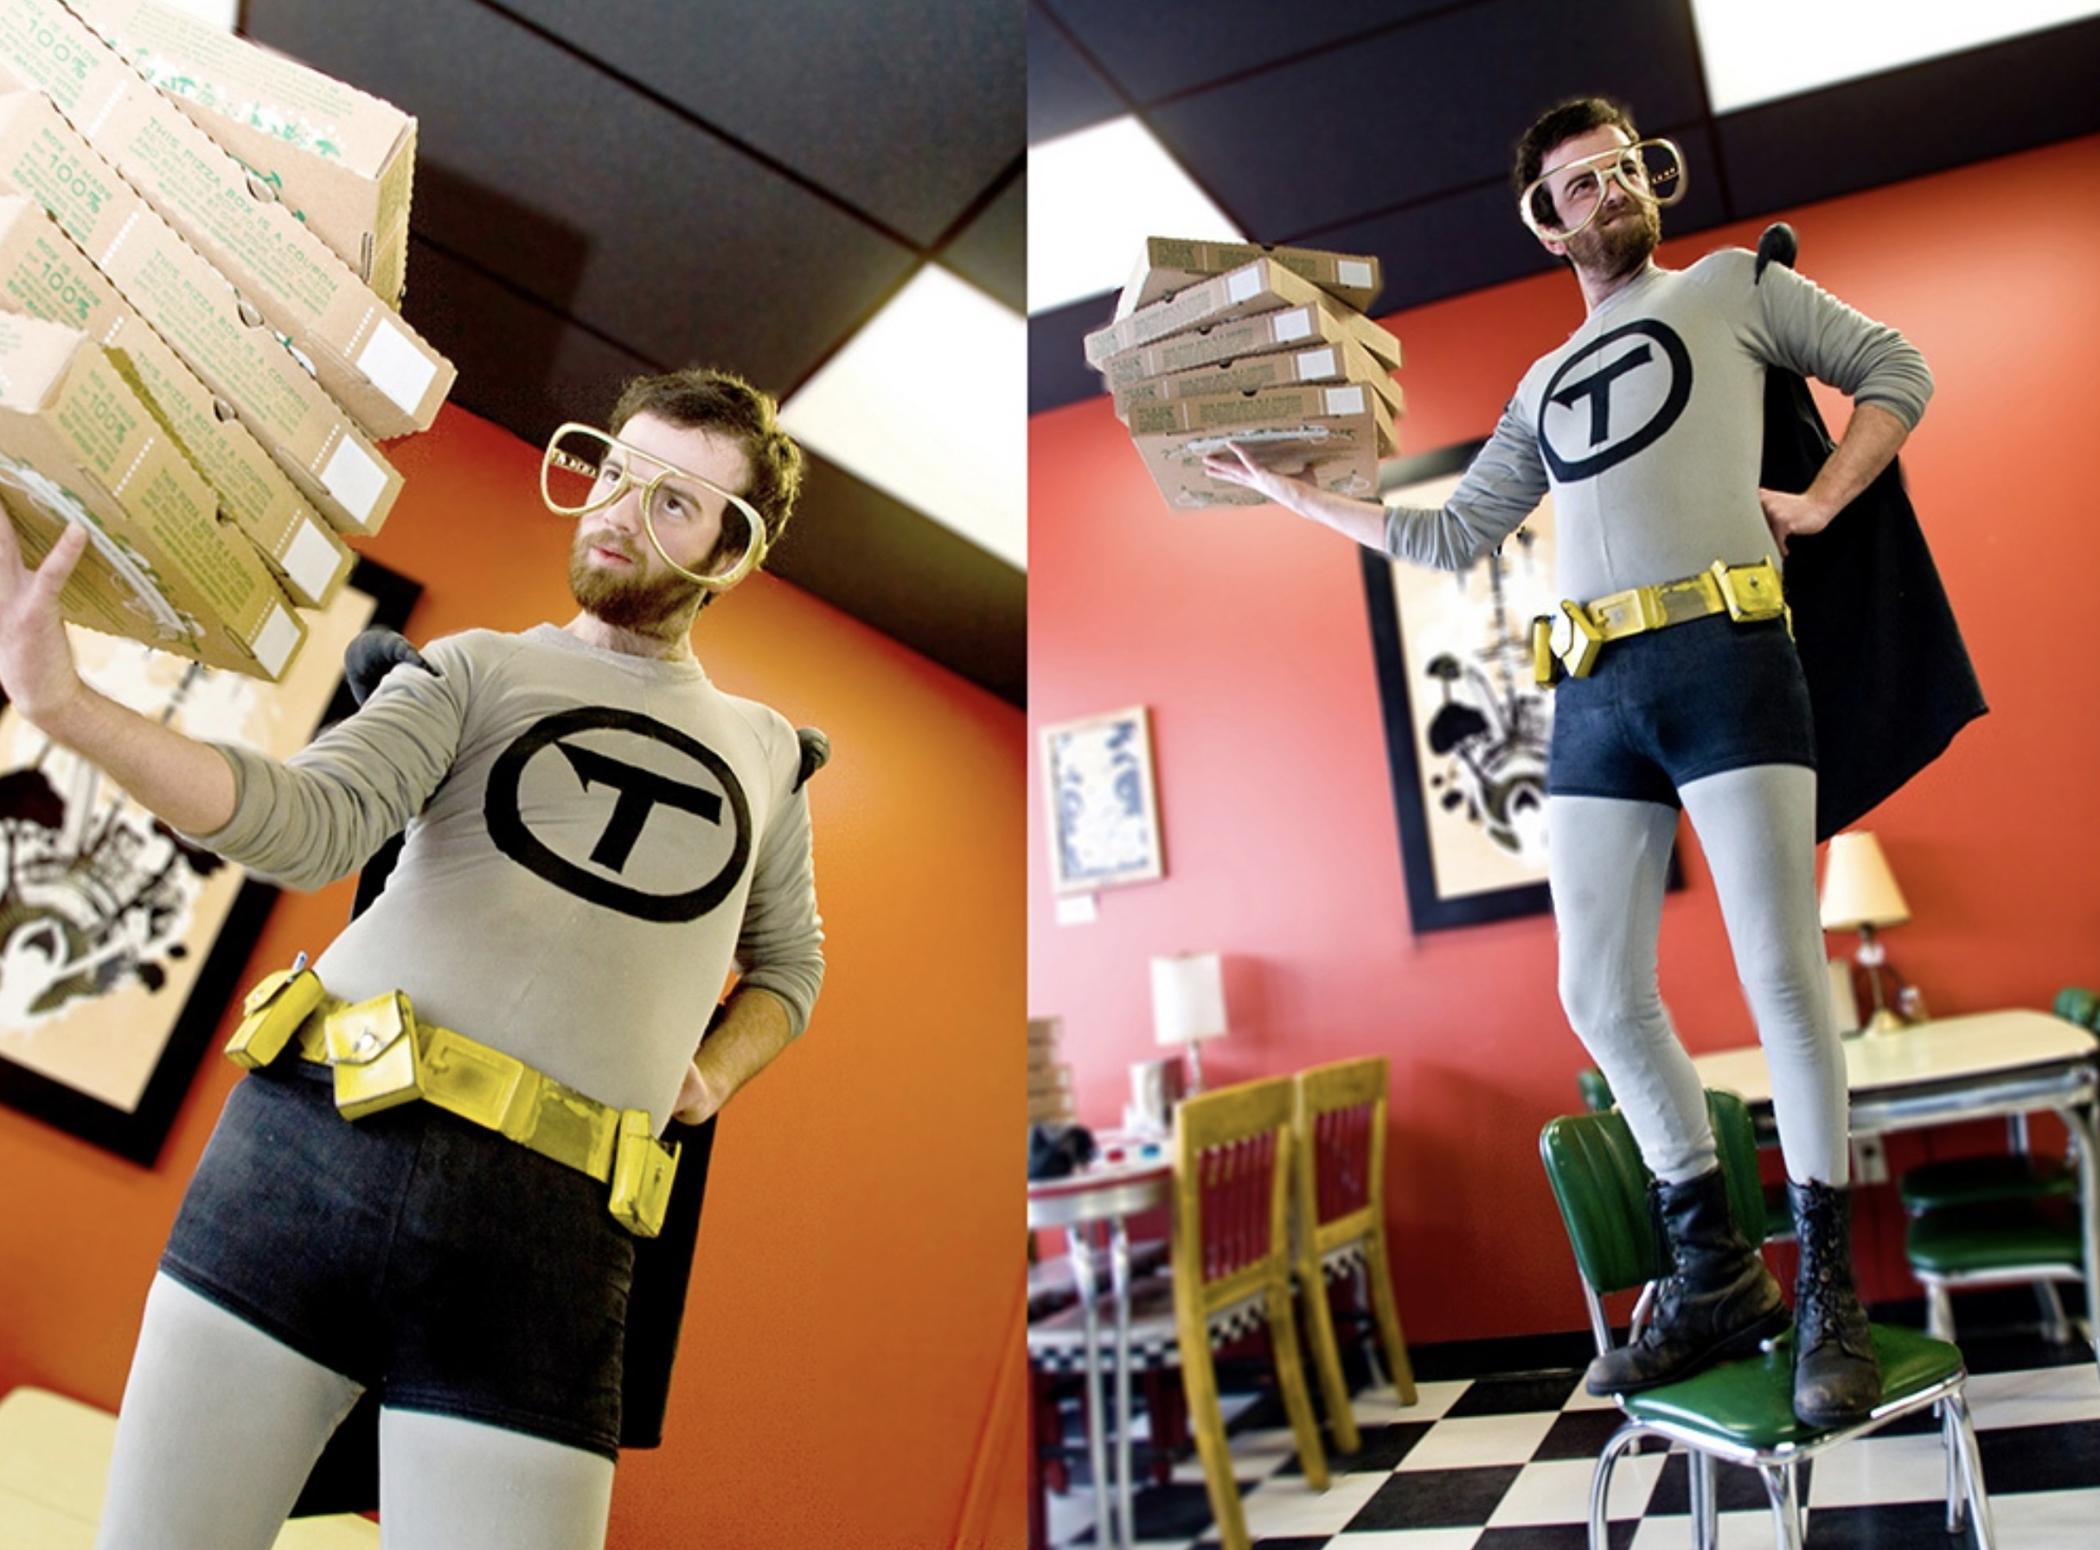 editorial photography galactic pizza superhero